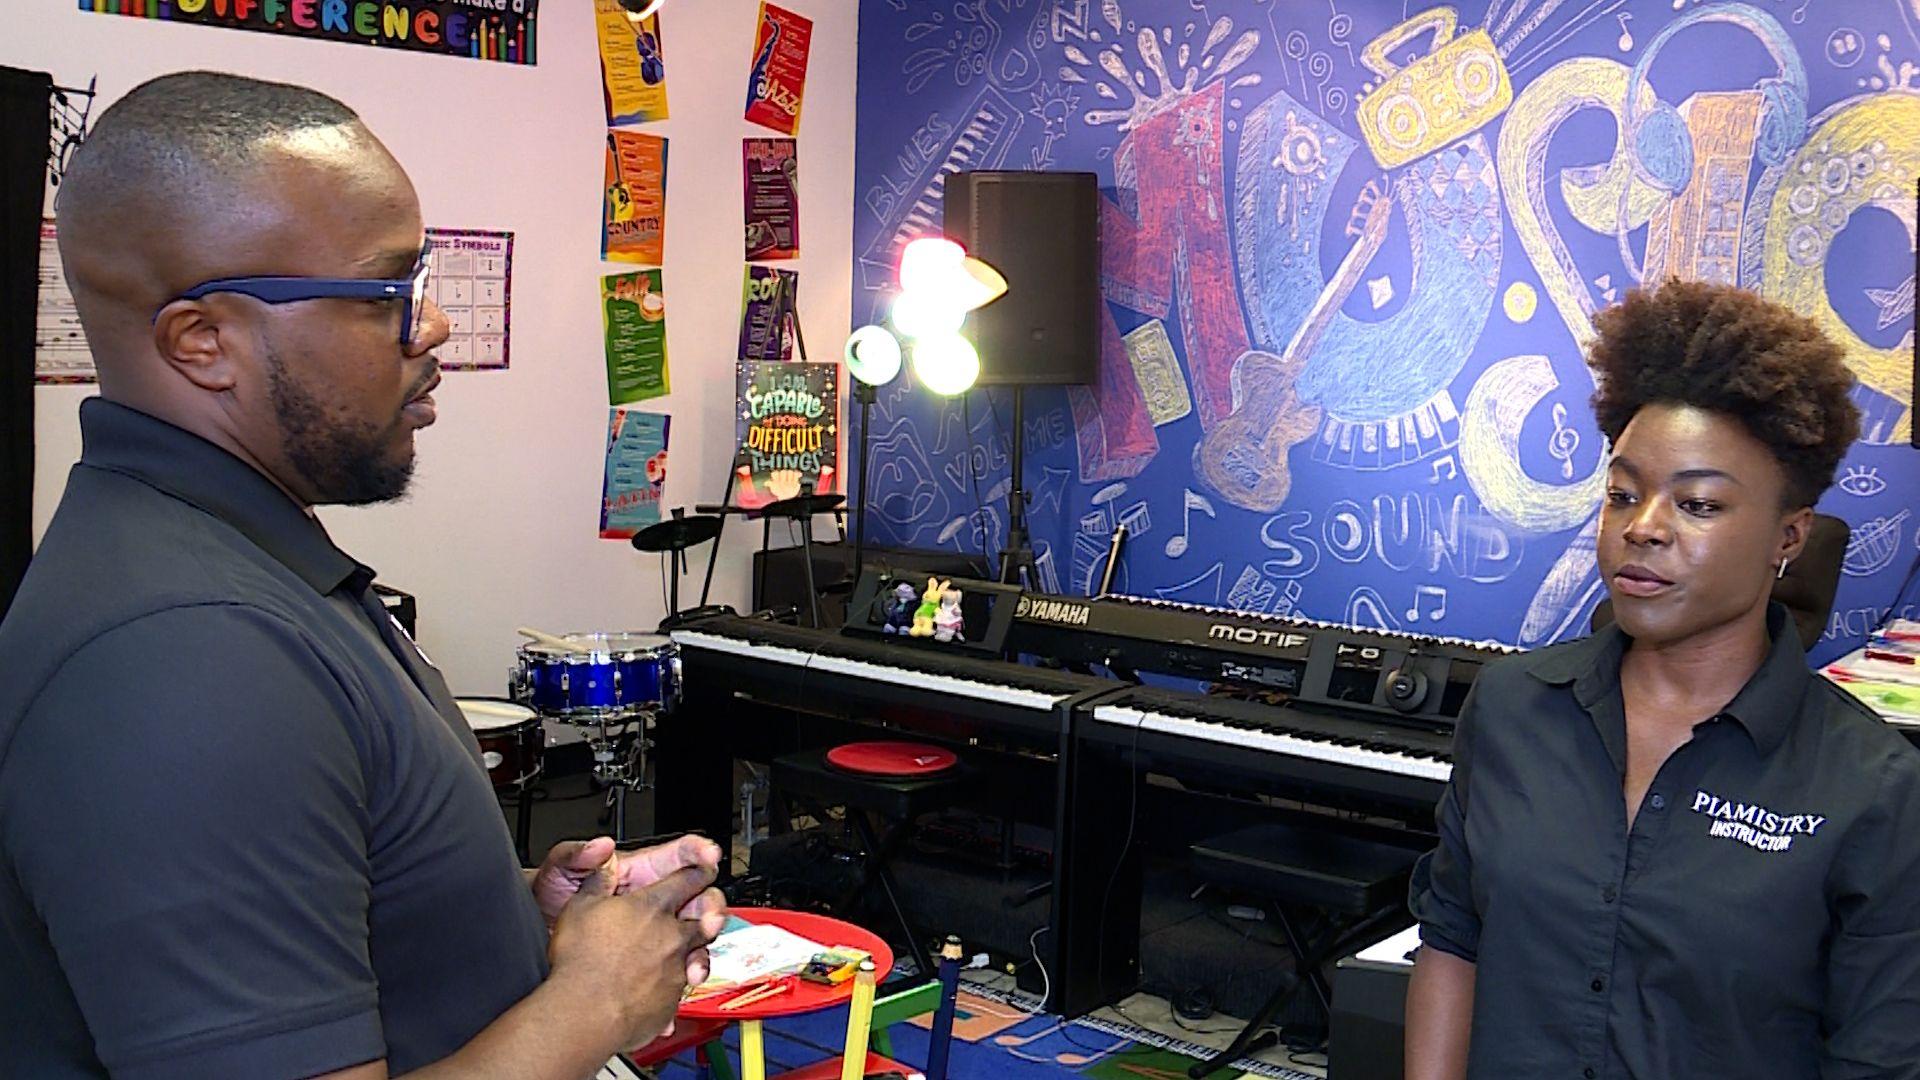 Birmingham firefighter teaches music when not answering emergency calls